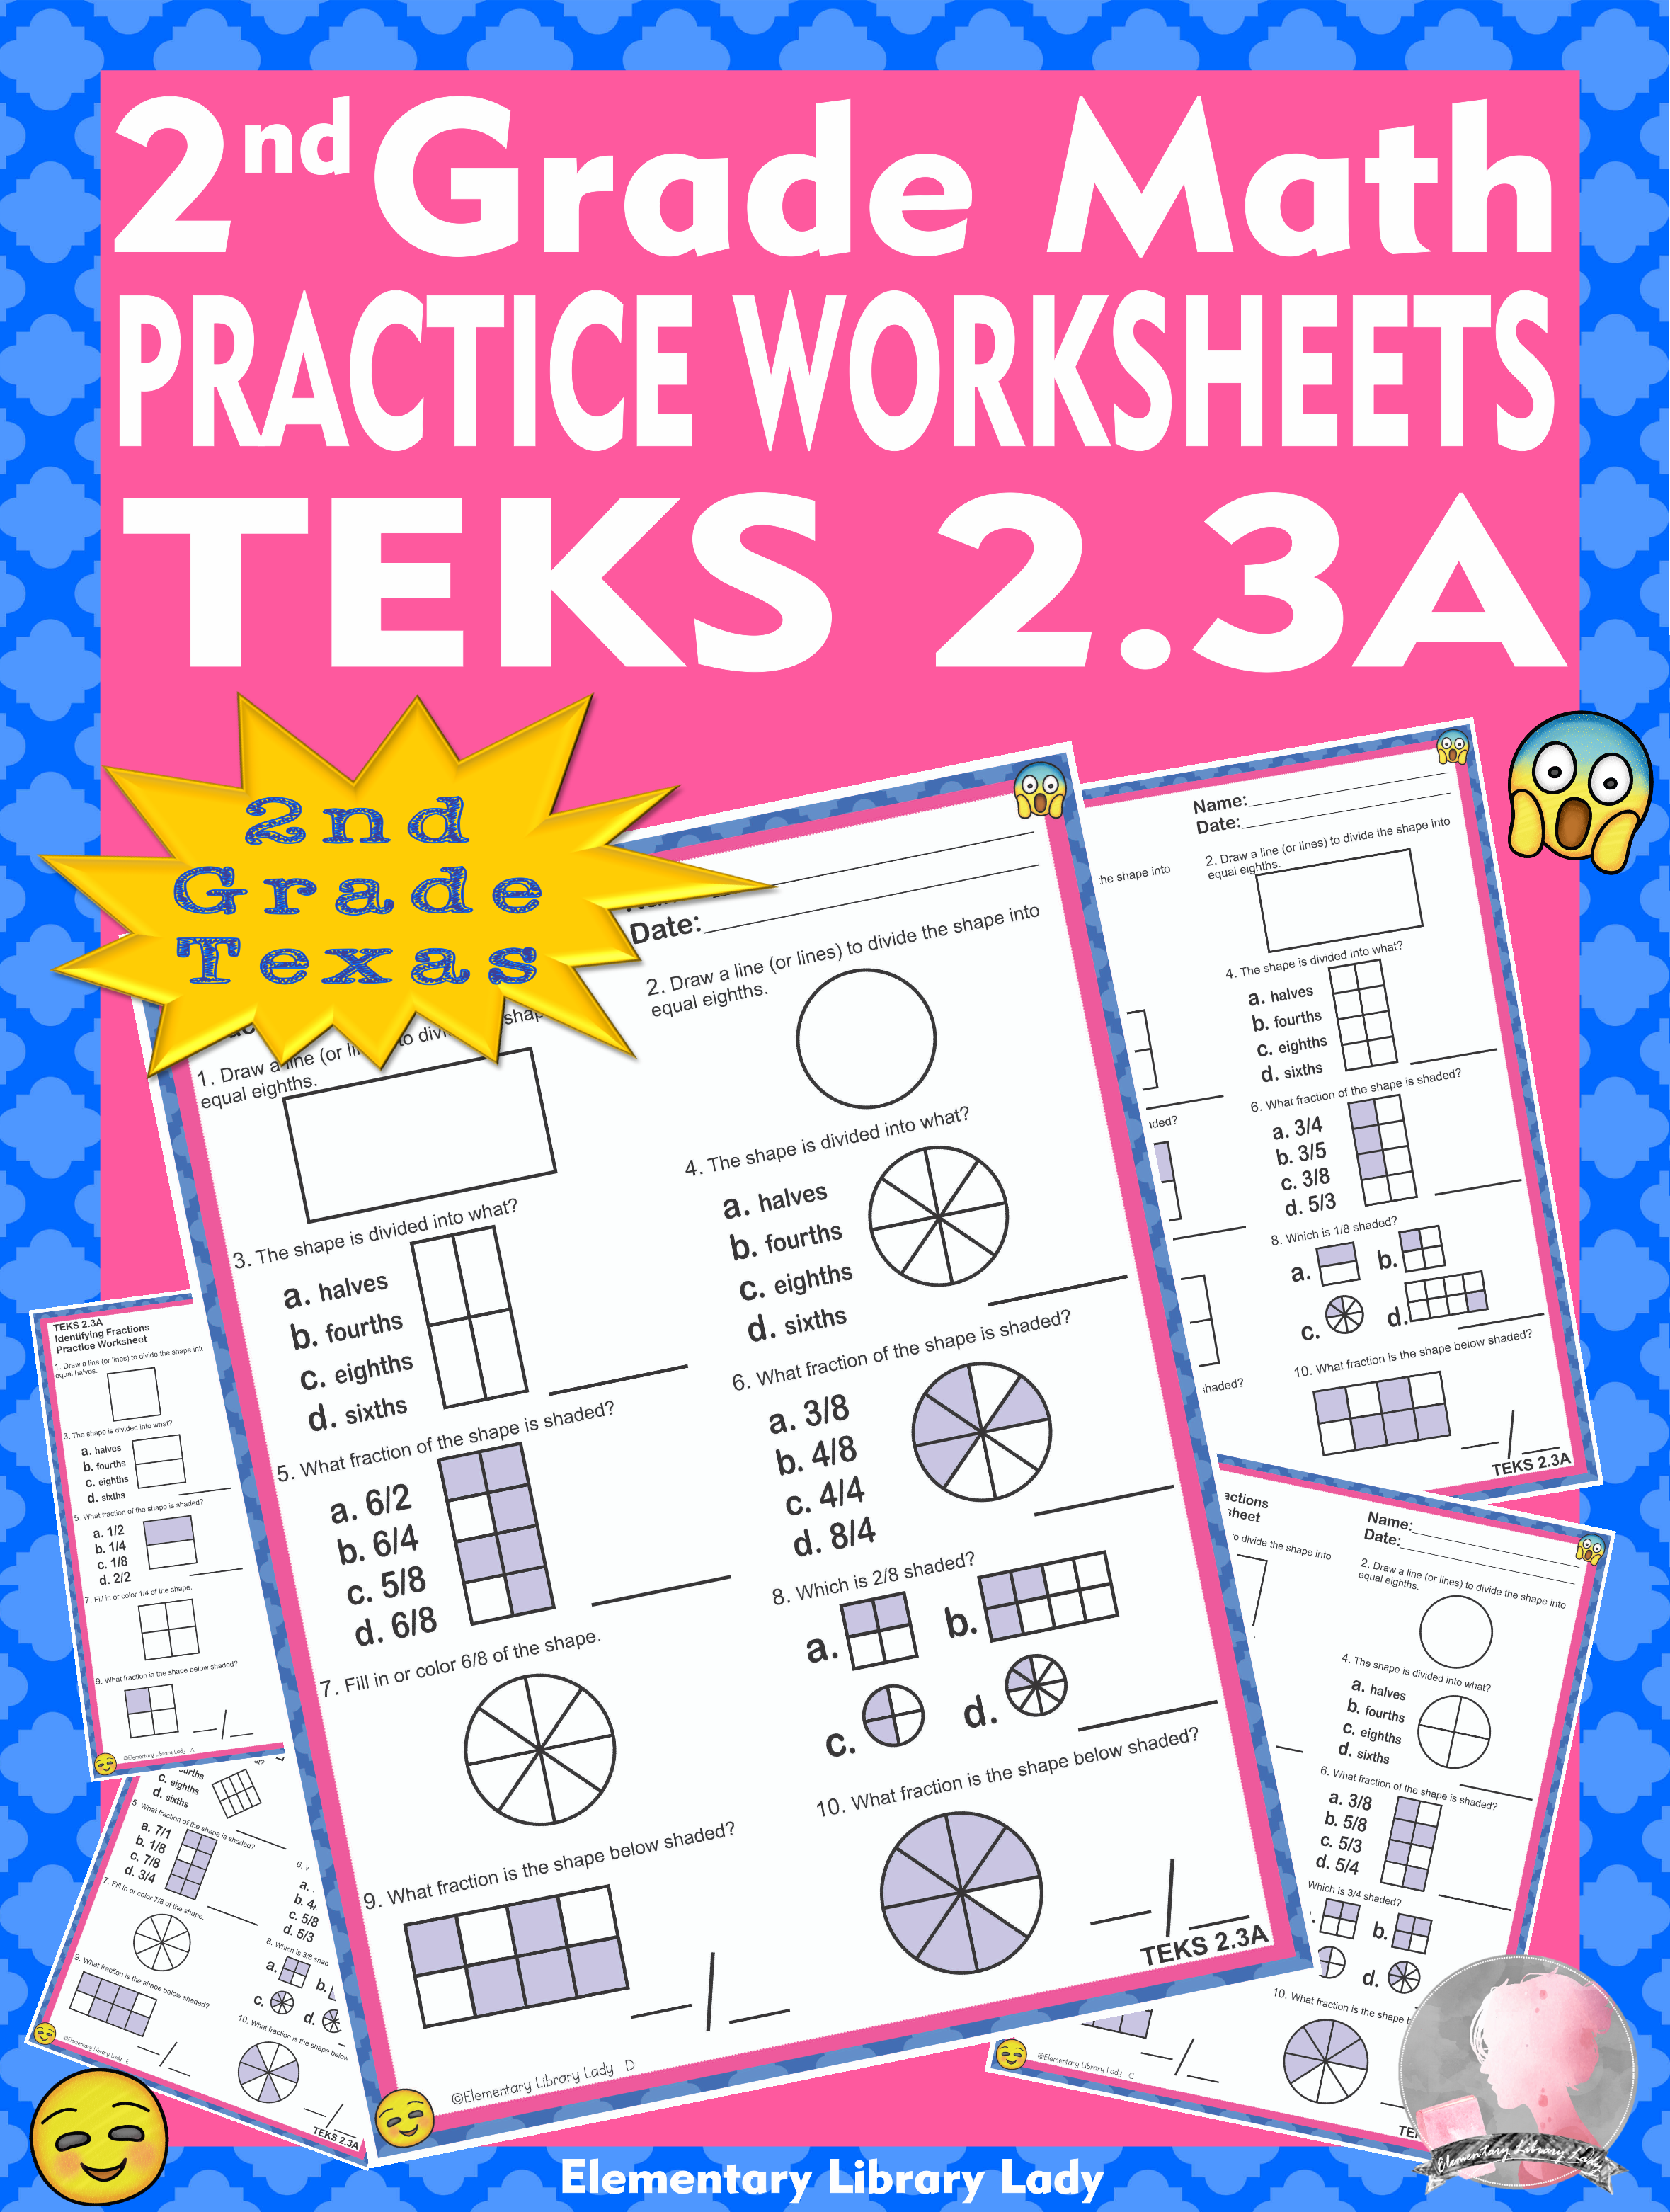 Math TEKS 2.3A Texas 2nd Grade Practice Worksheets Identifying Fractions   Math  teks [ 3124 x 2359 Pixel ]